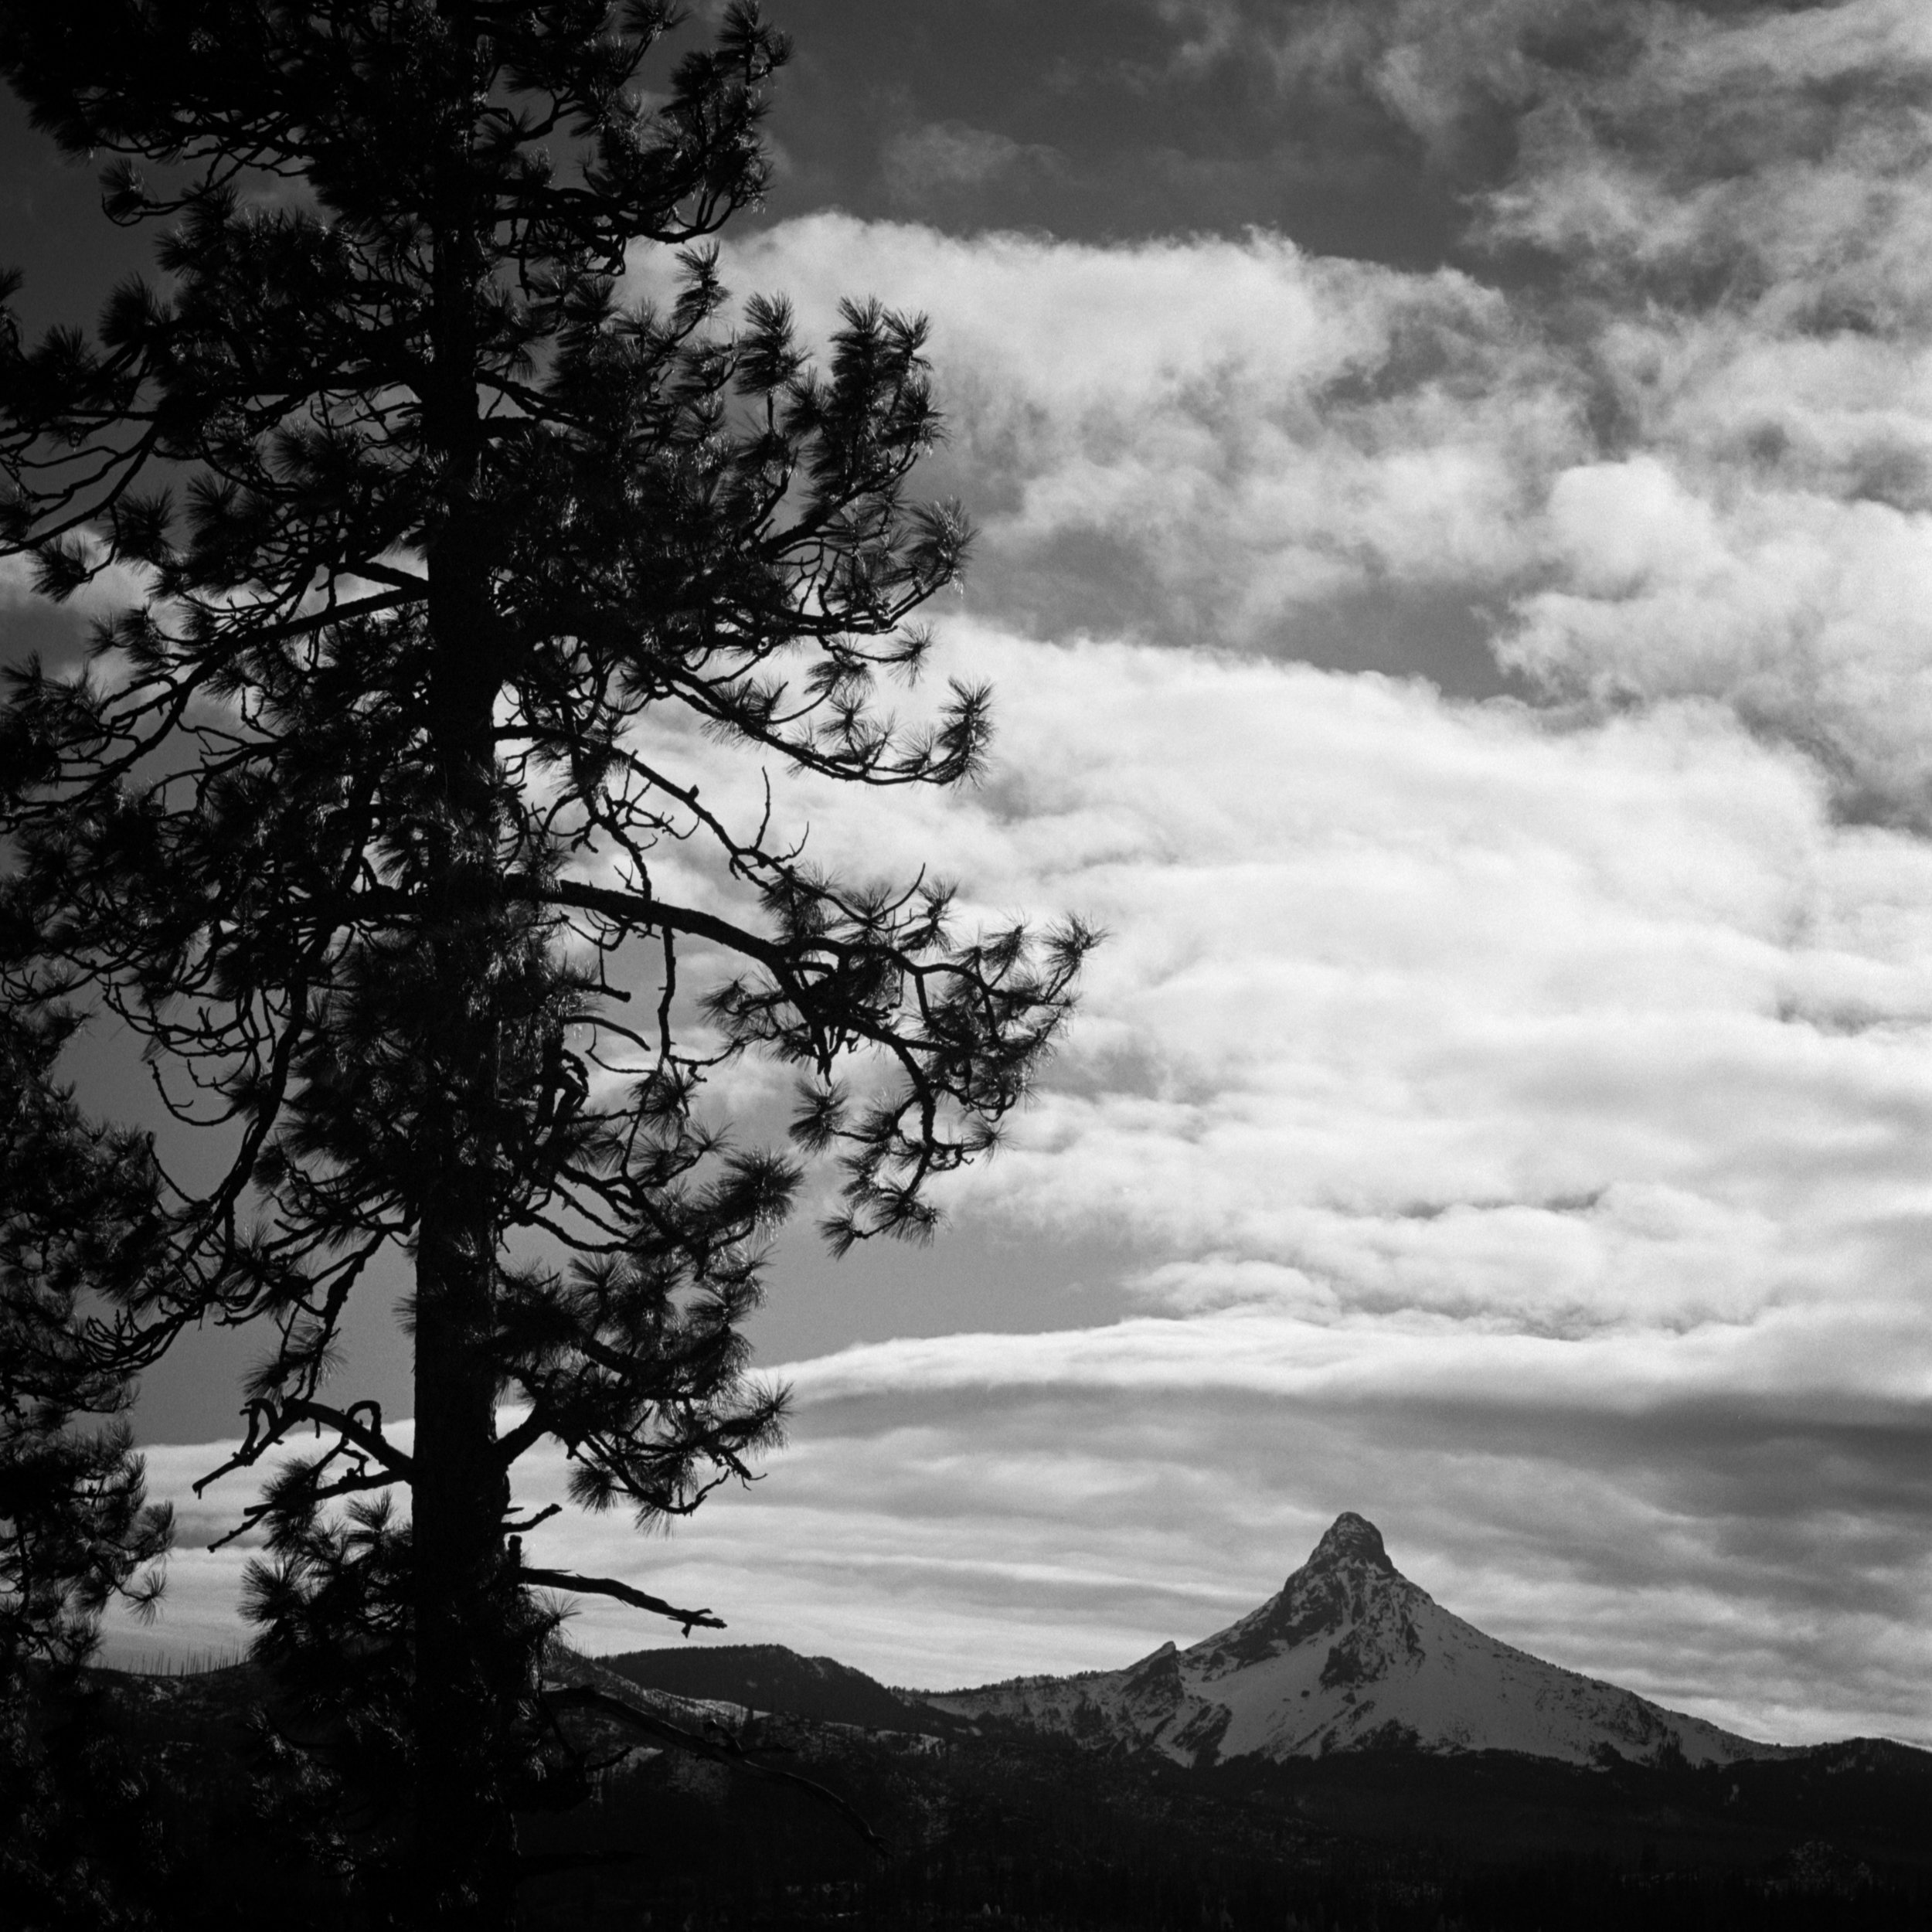 Mt Washington, October 2017